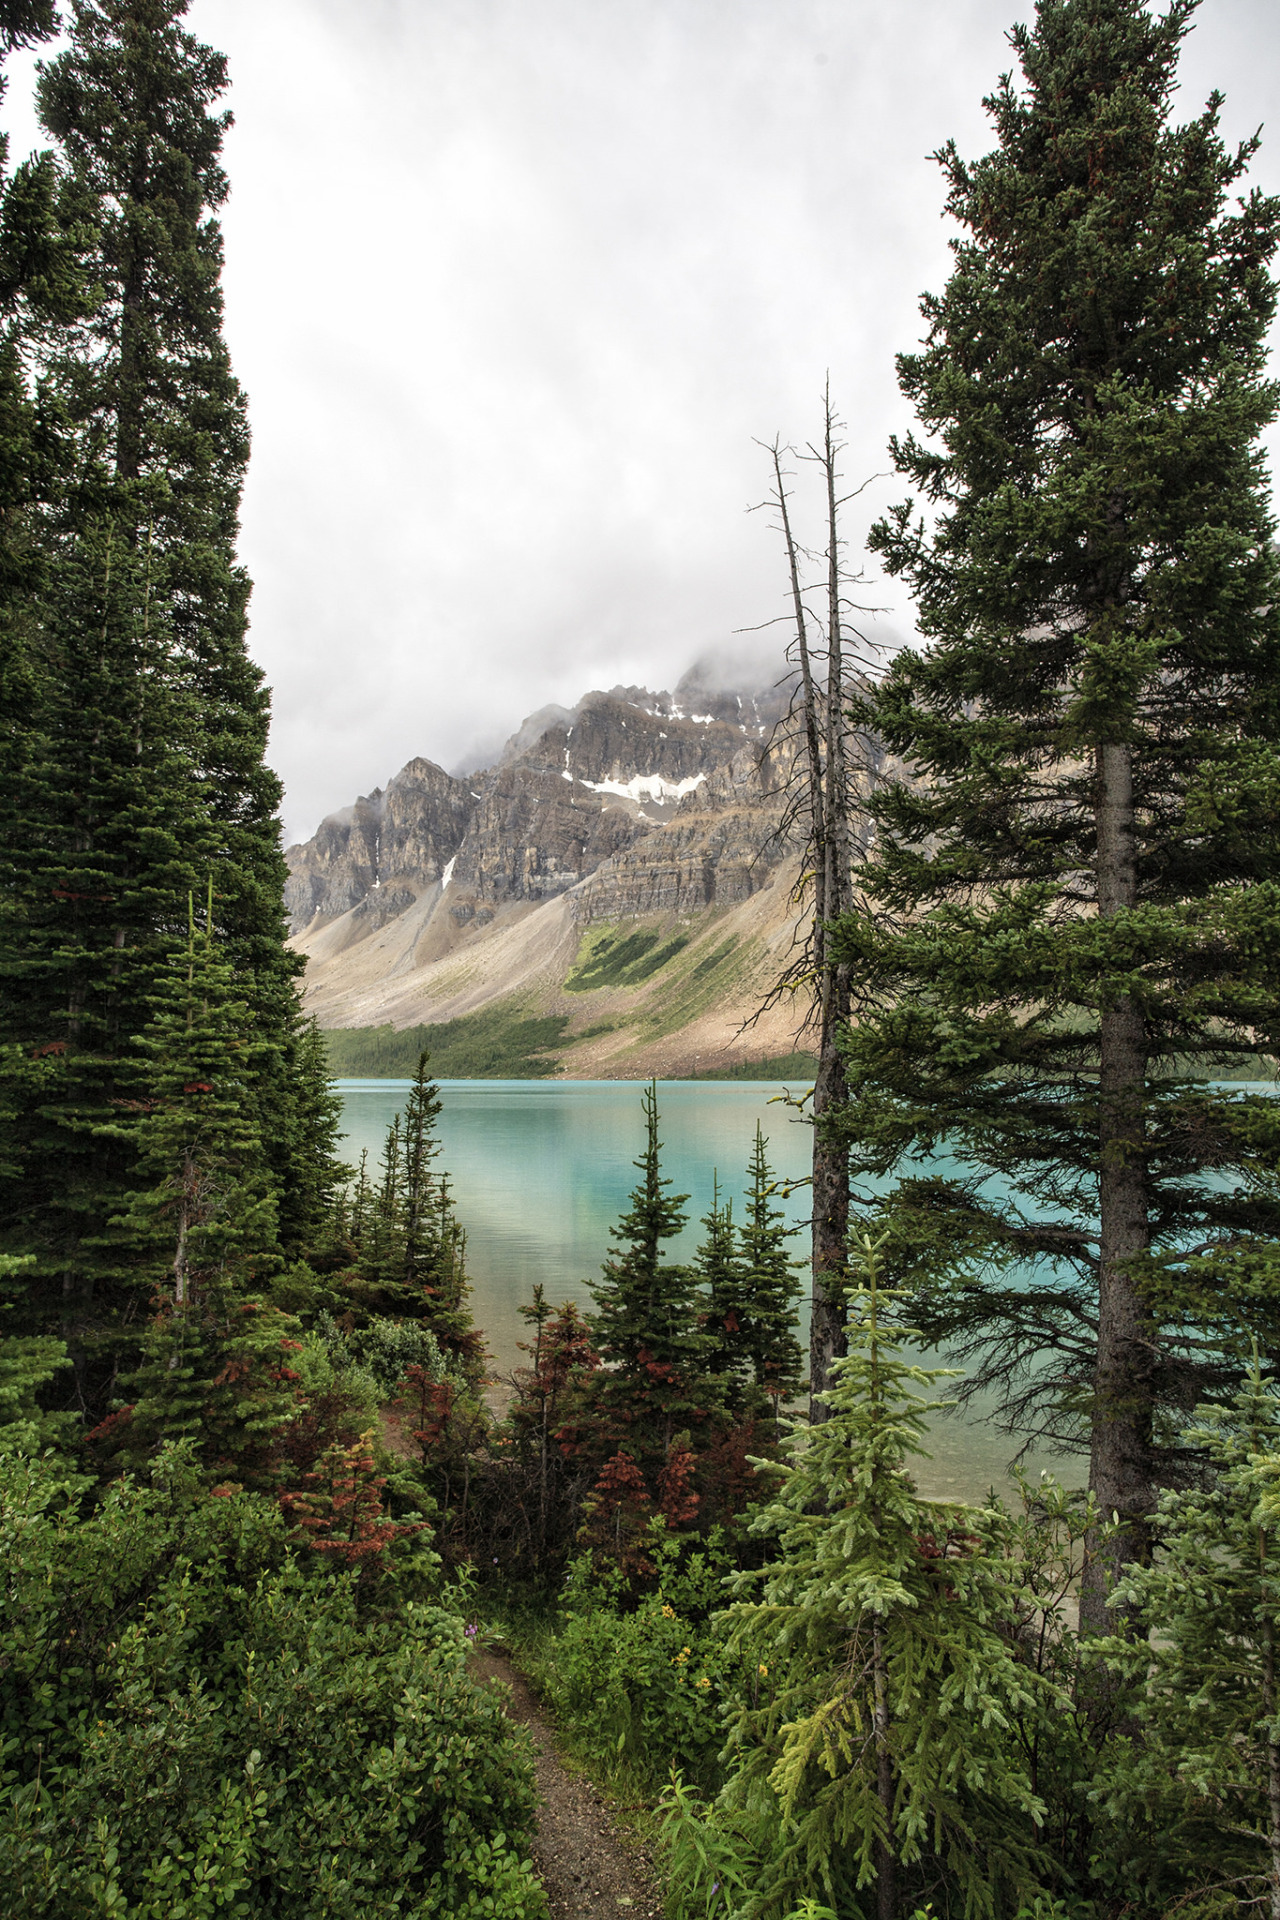 Bow Lake, Banff National Park / Canada